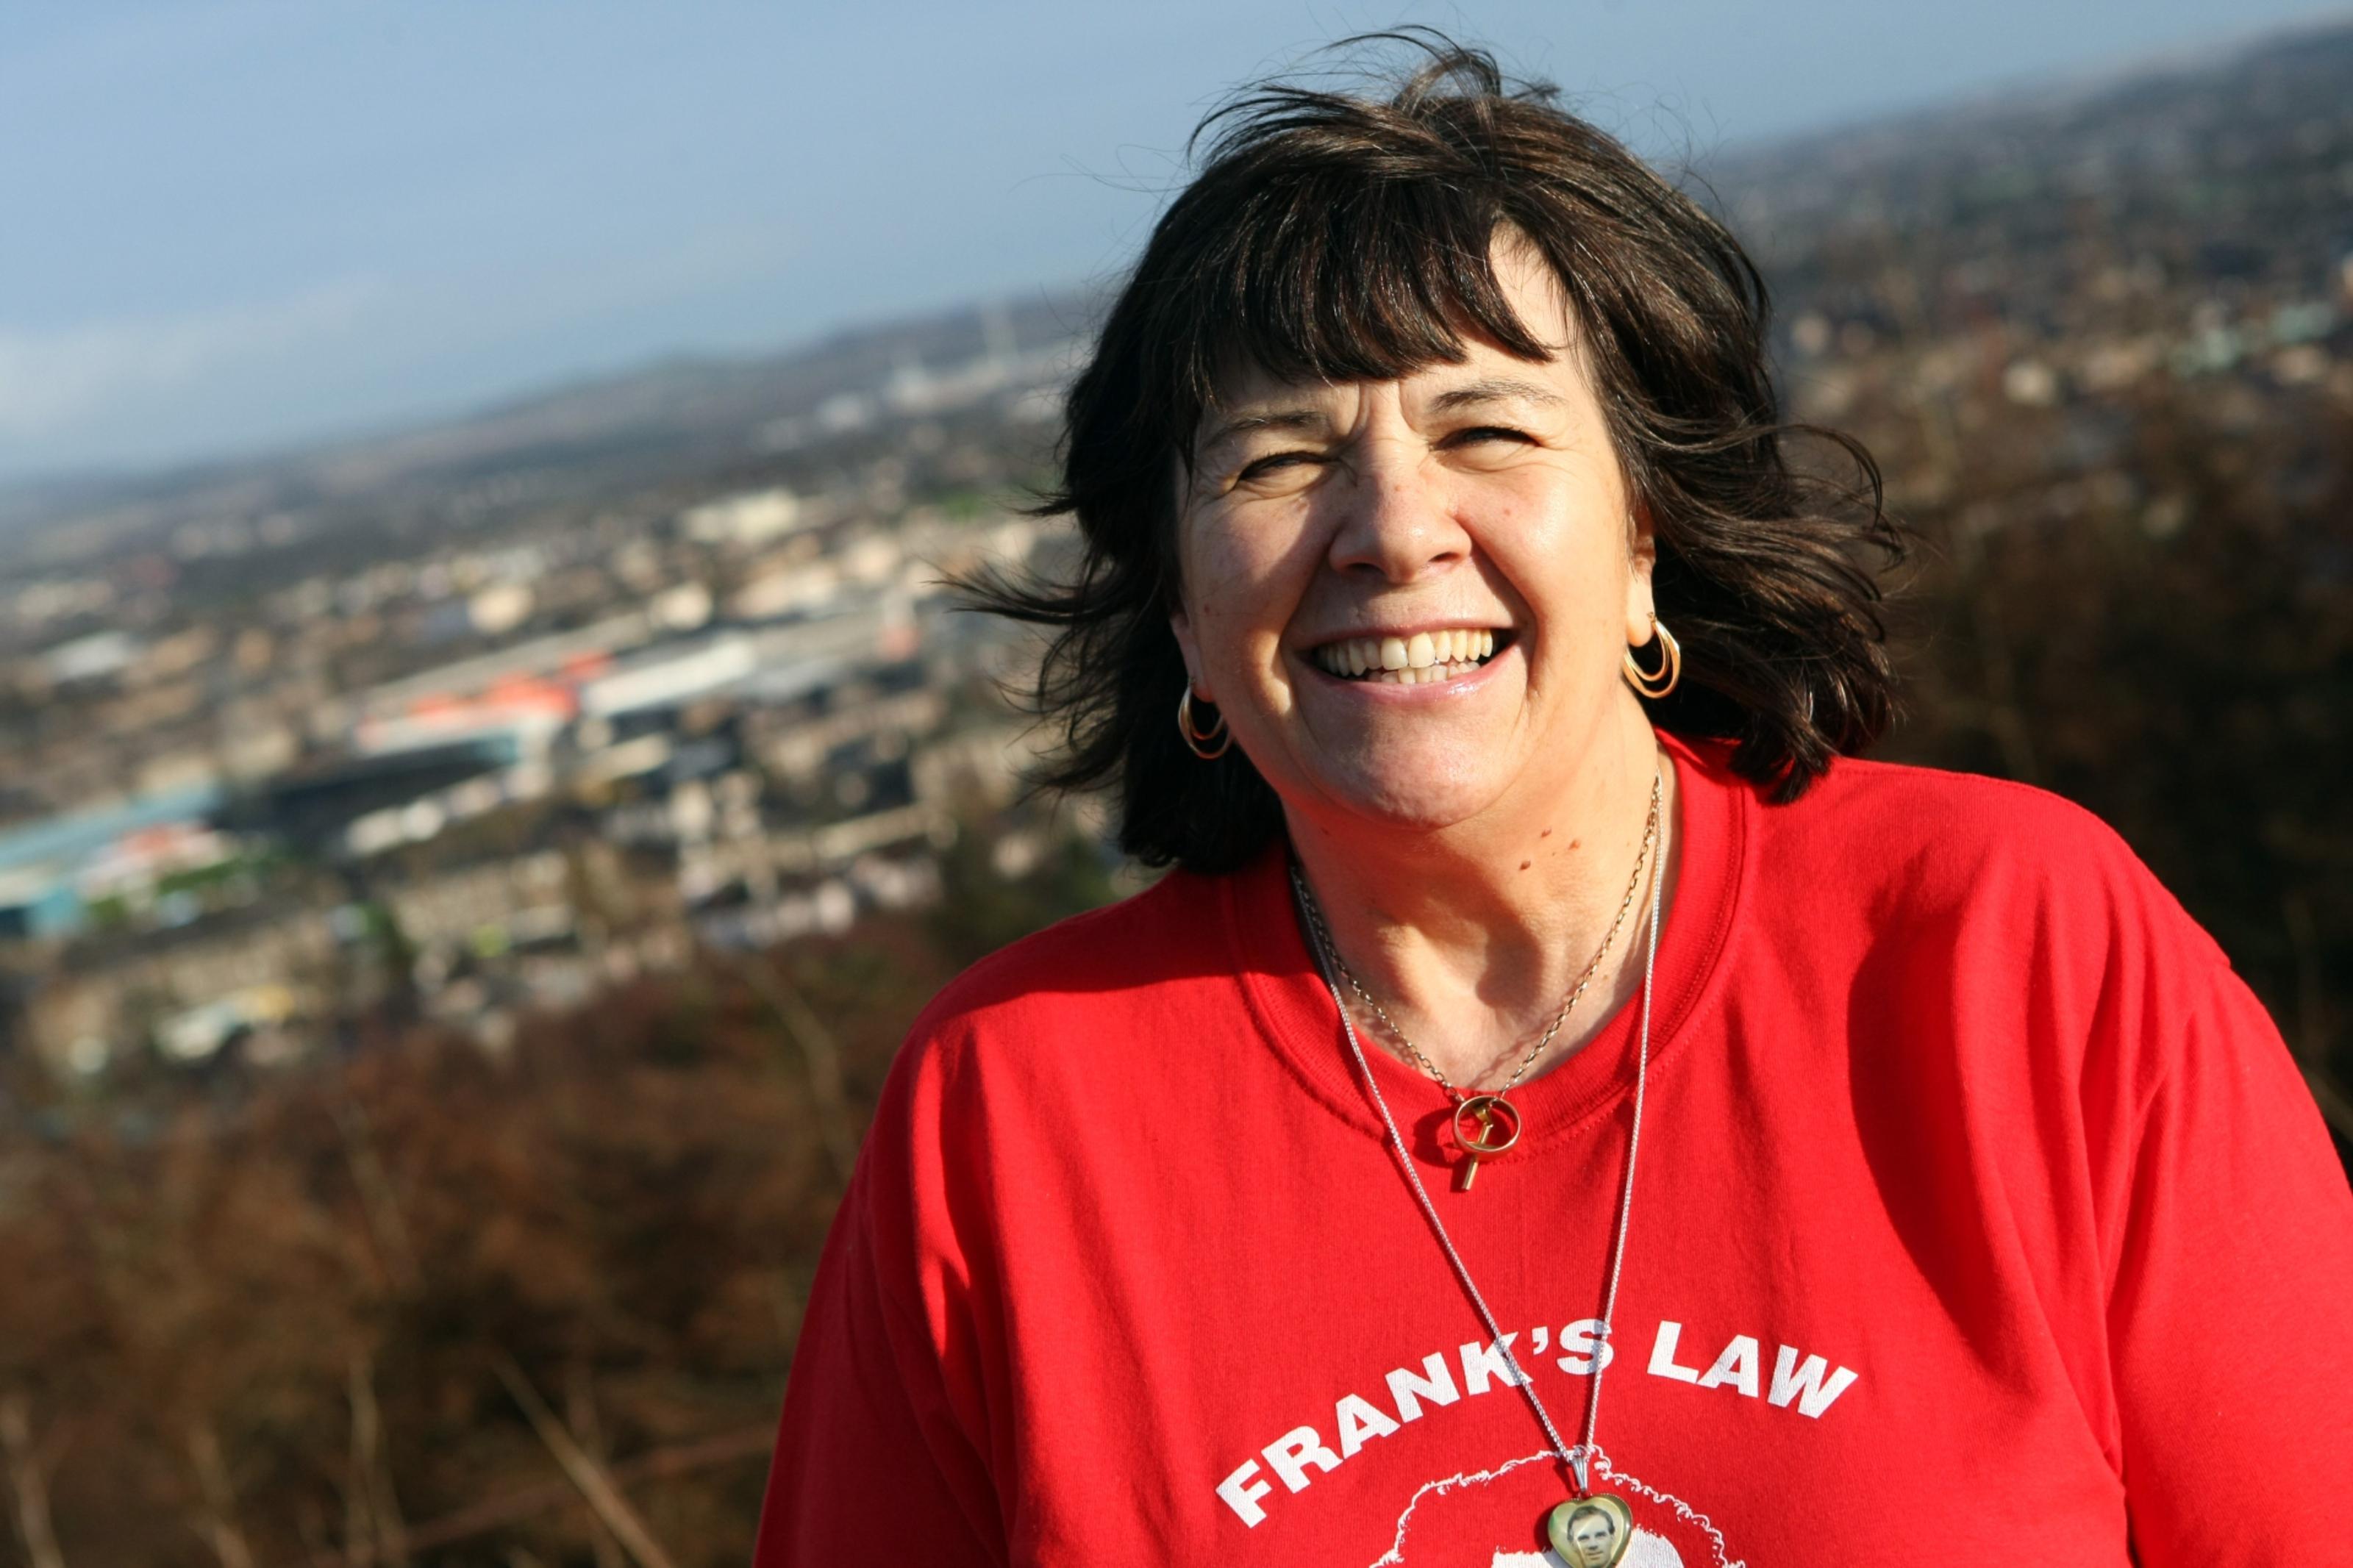 Frank's Law campaigner Amanda Kopel